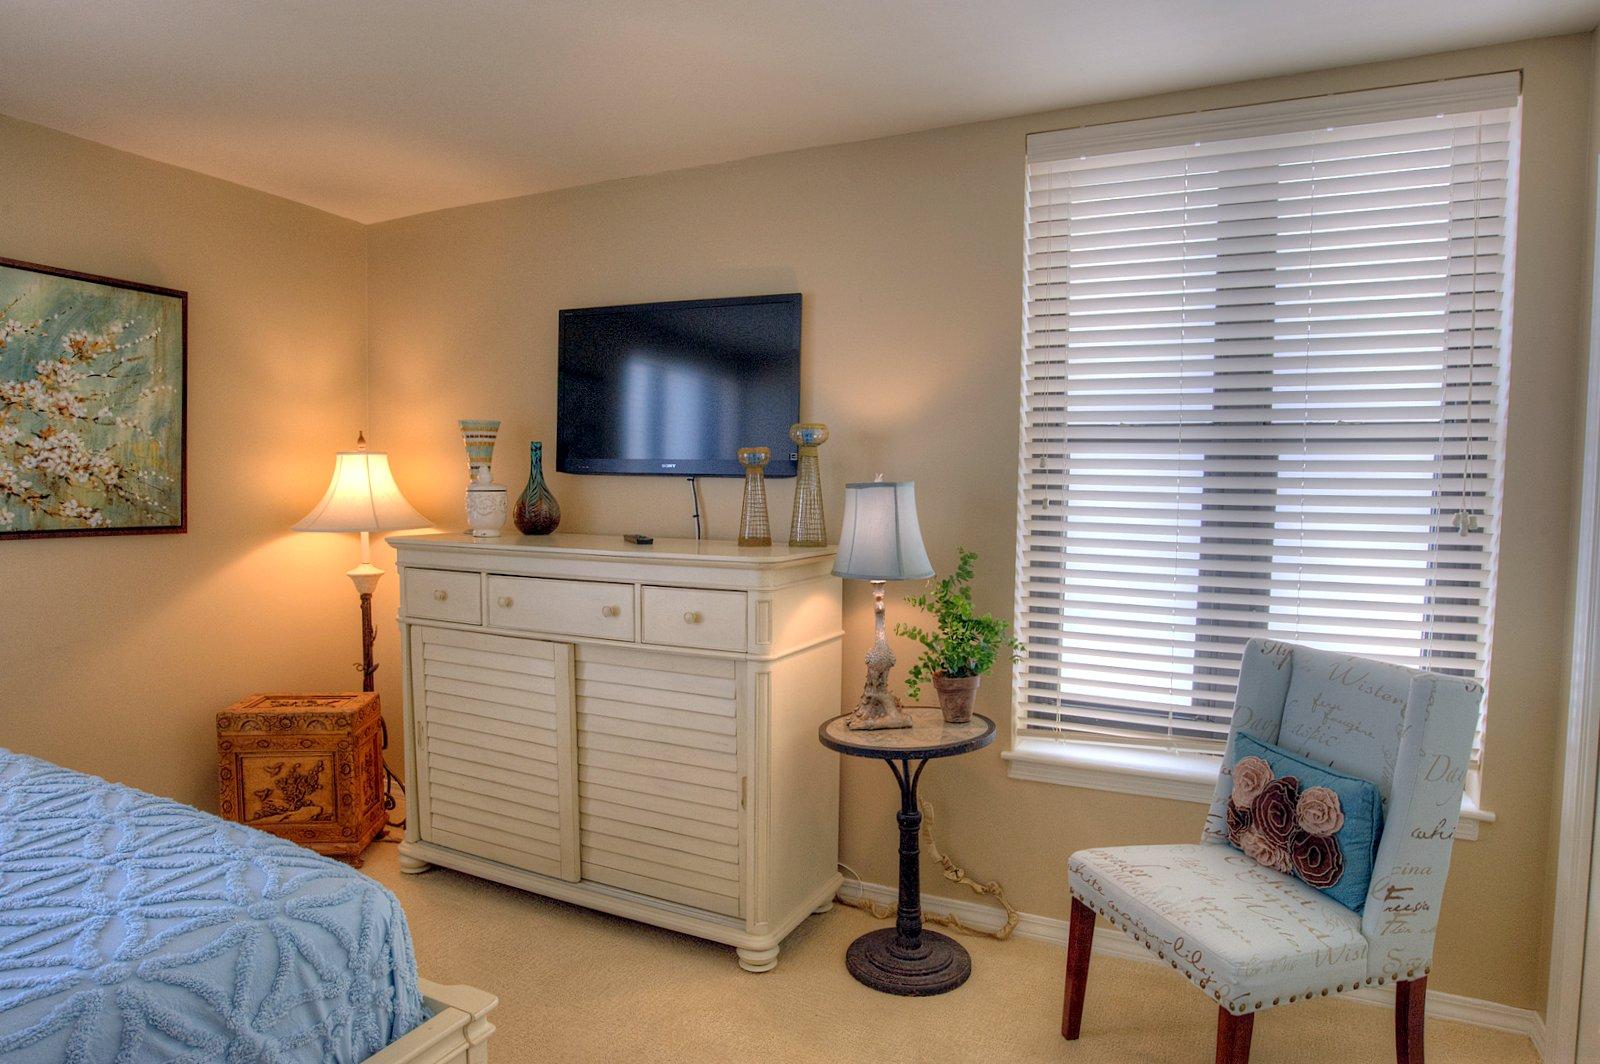 4106 Beachside One Condo rental in Beachside Towers at Sandestin in Destin Florida - #16